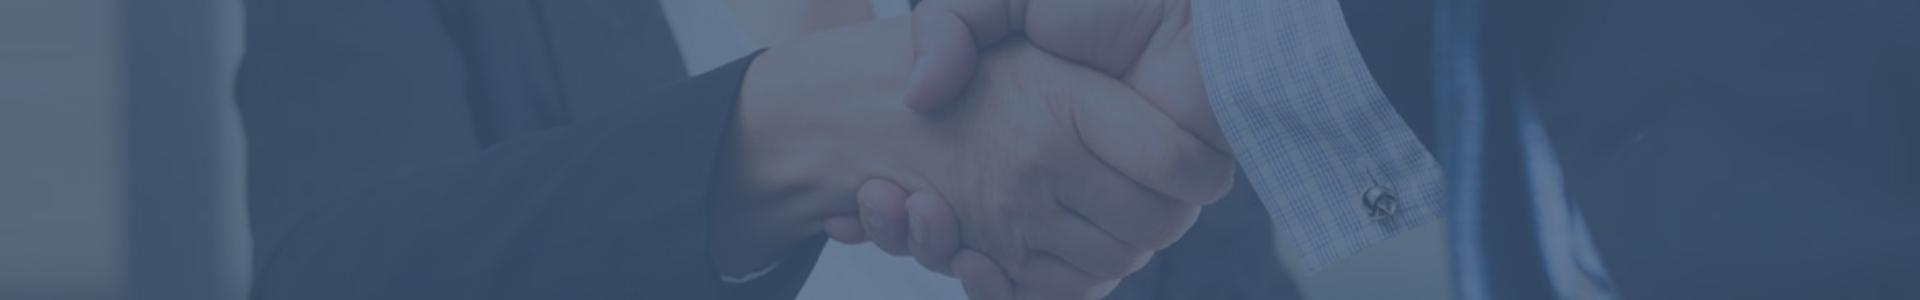 Uścisk dłoni dwóch postaci